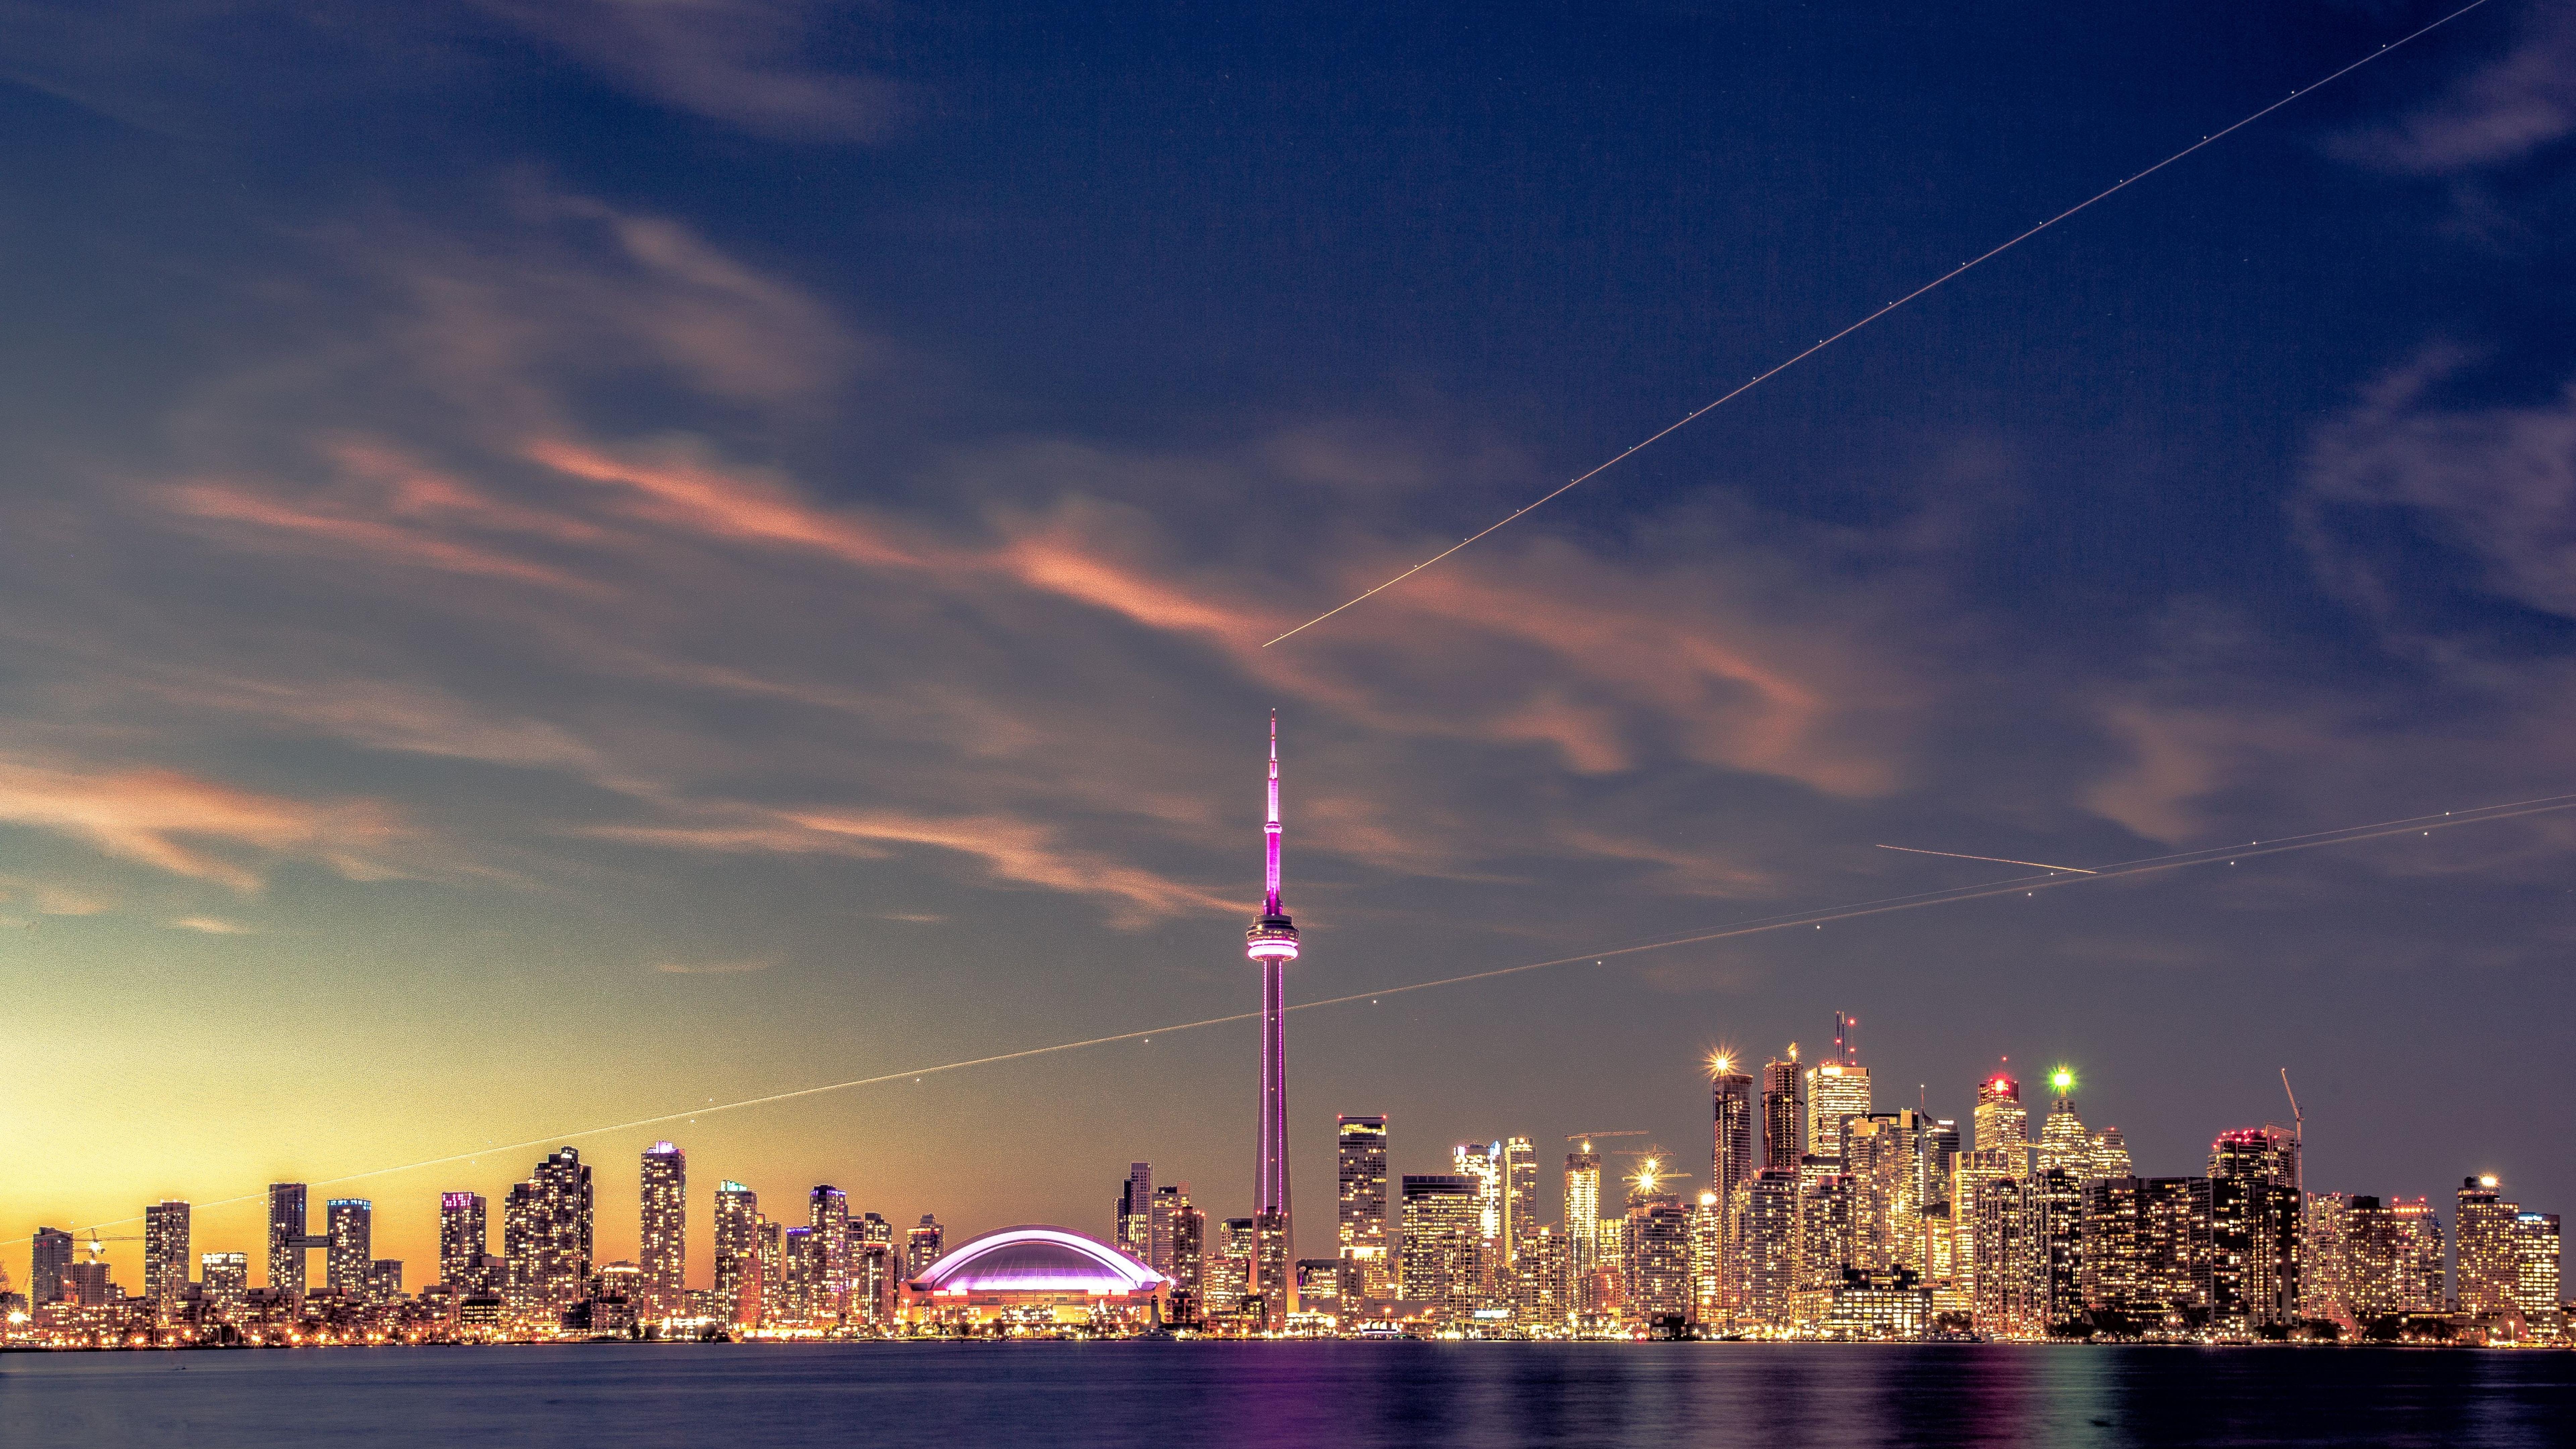 Toronto Ontario Cityscape In Sunset  Hd 4k Wallpaper